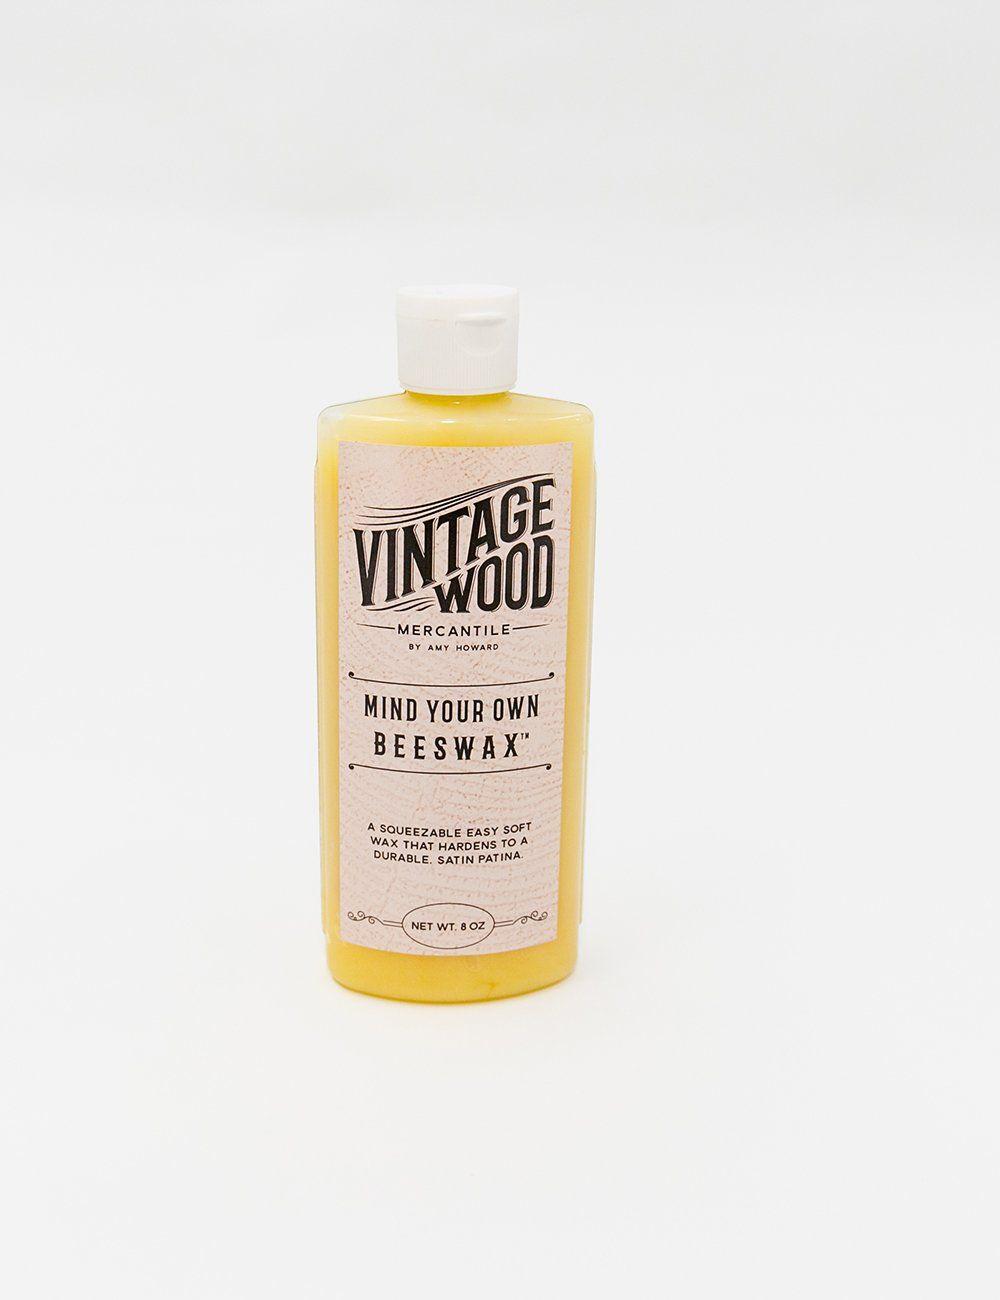 Mind Your Own Beeswax 8 Oz Beeswax Wax Vintage Wood